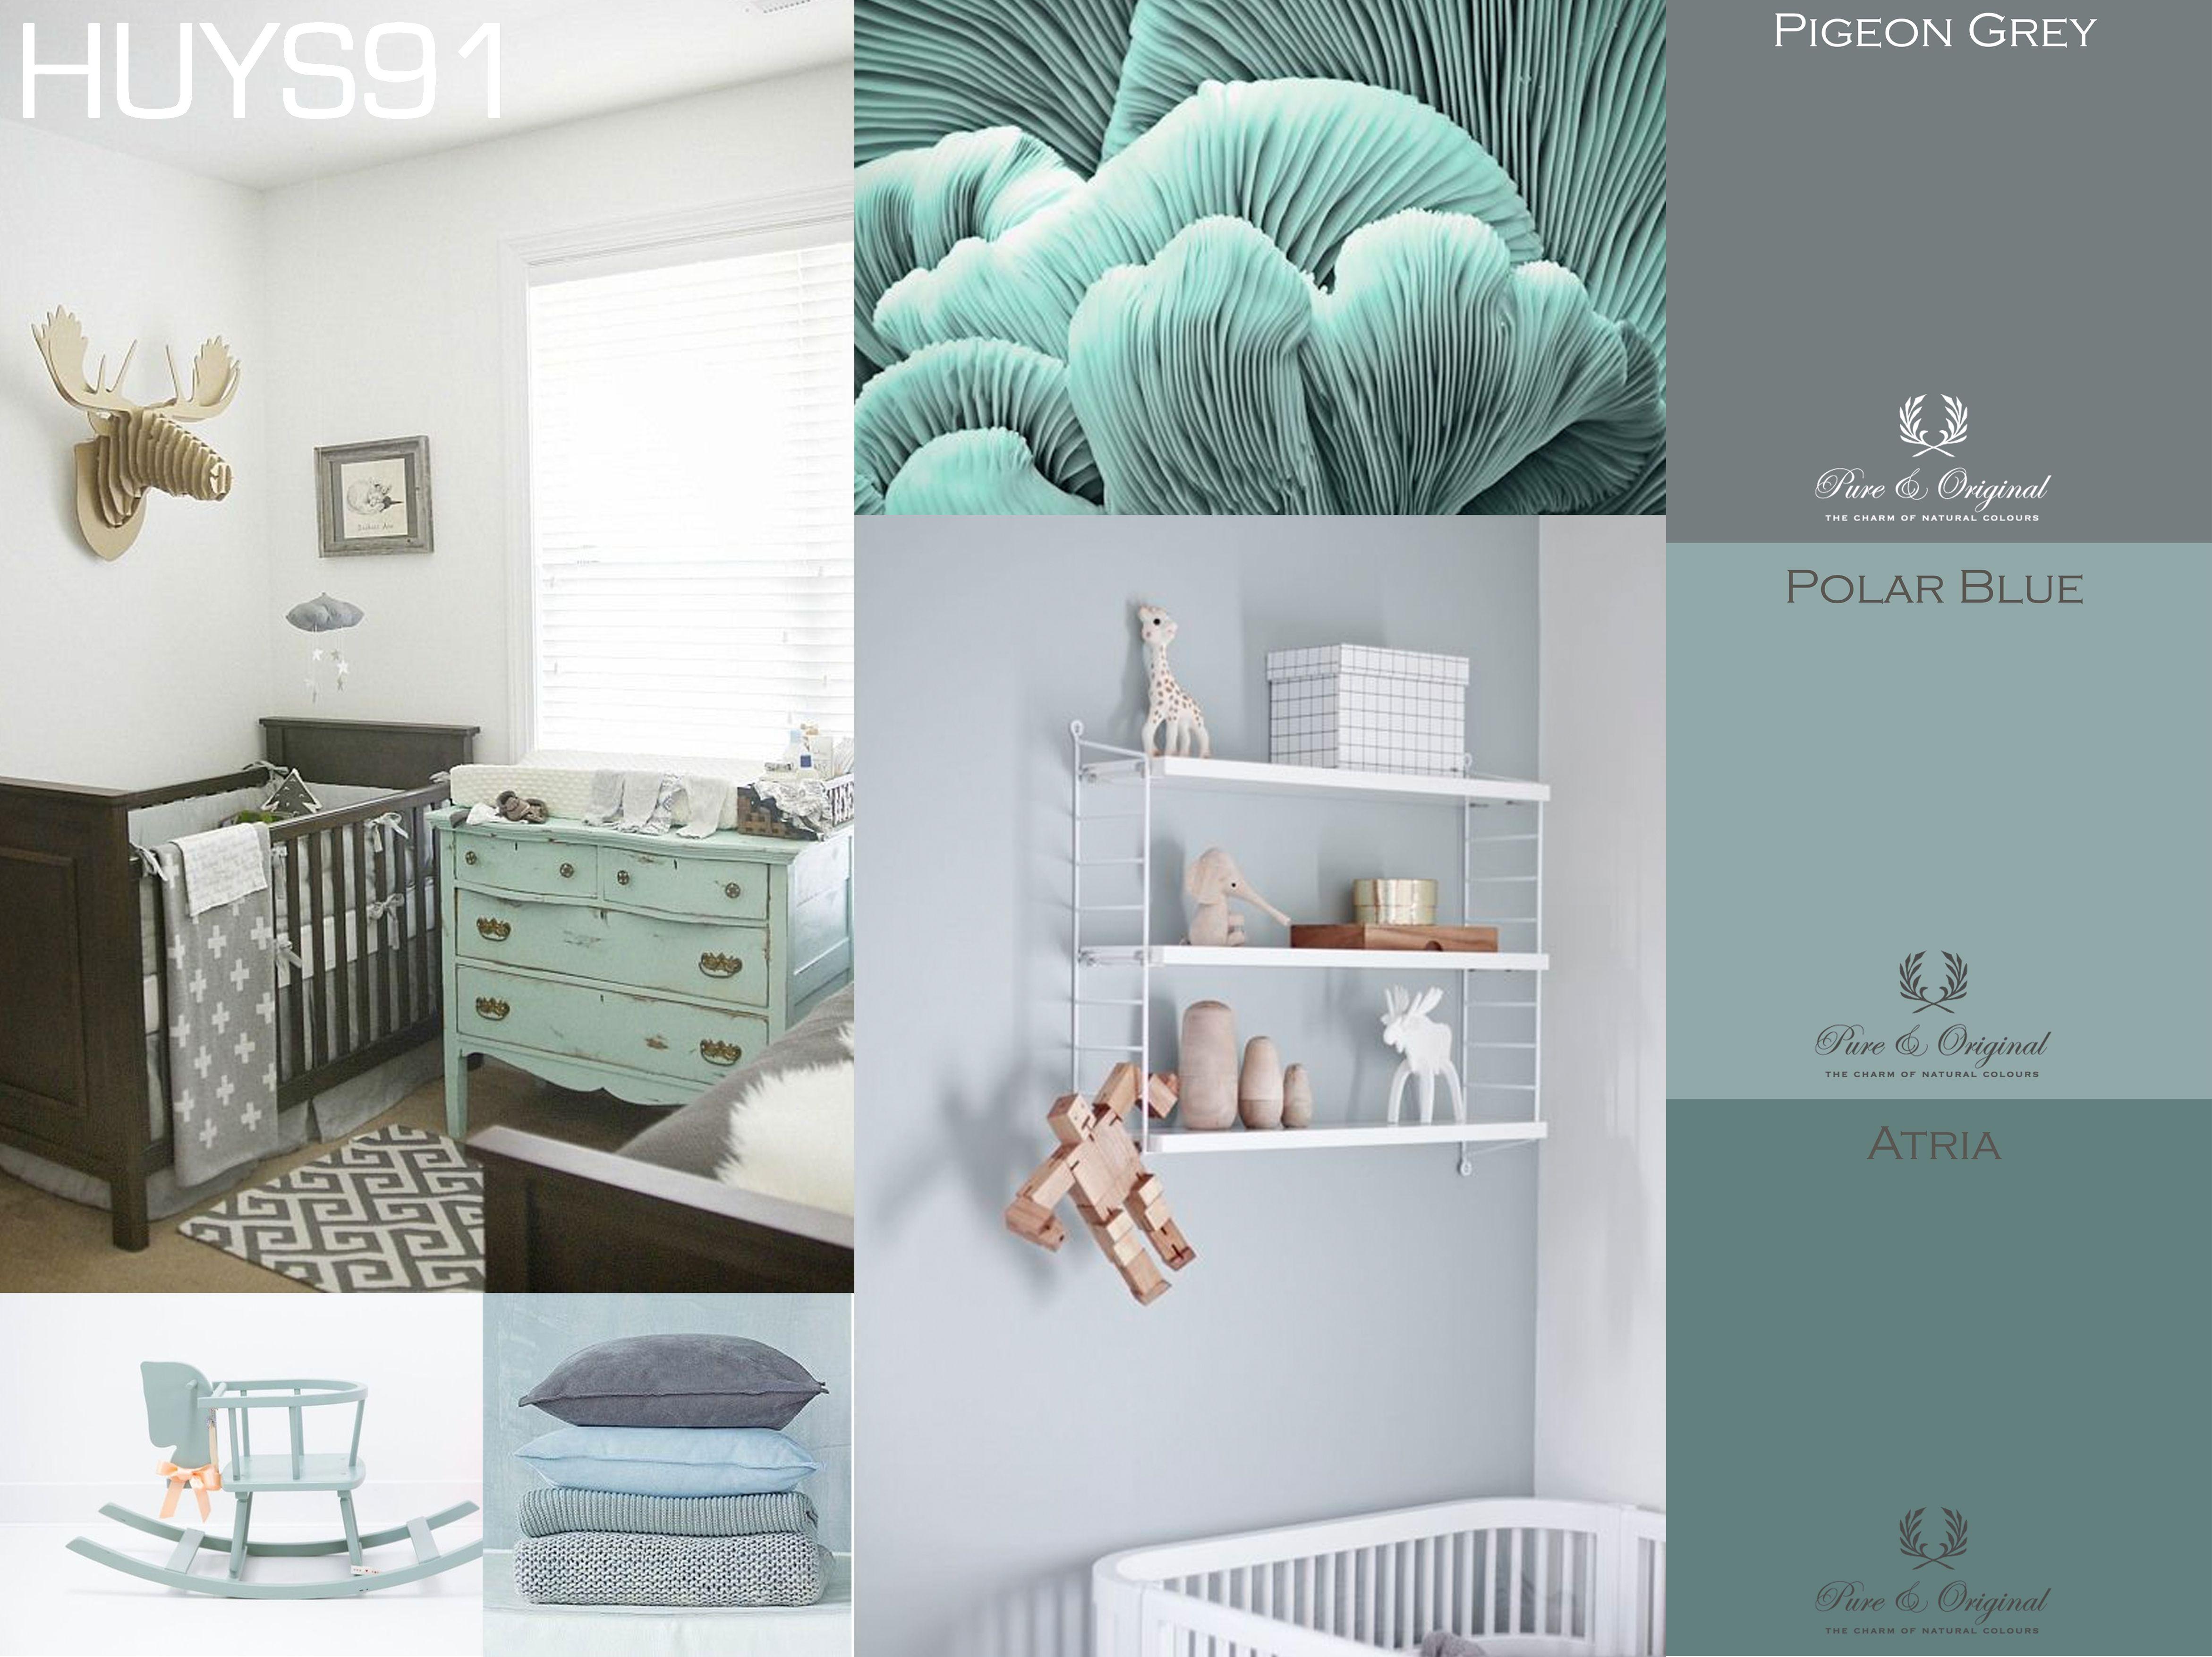 Blog babykamer kinderkamer kleuren pure & original blog huys91